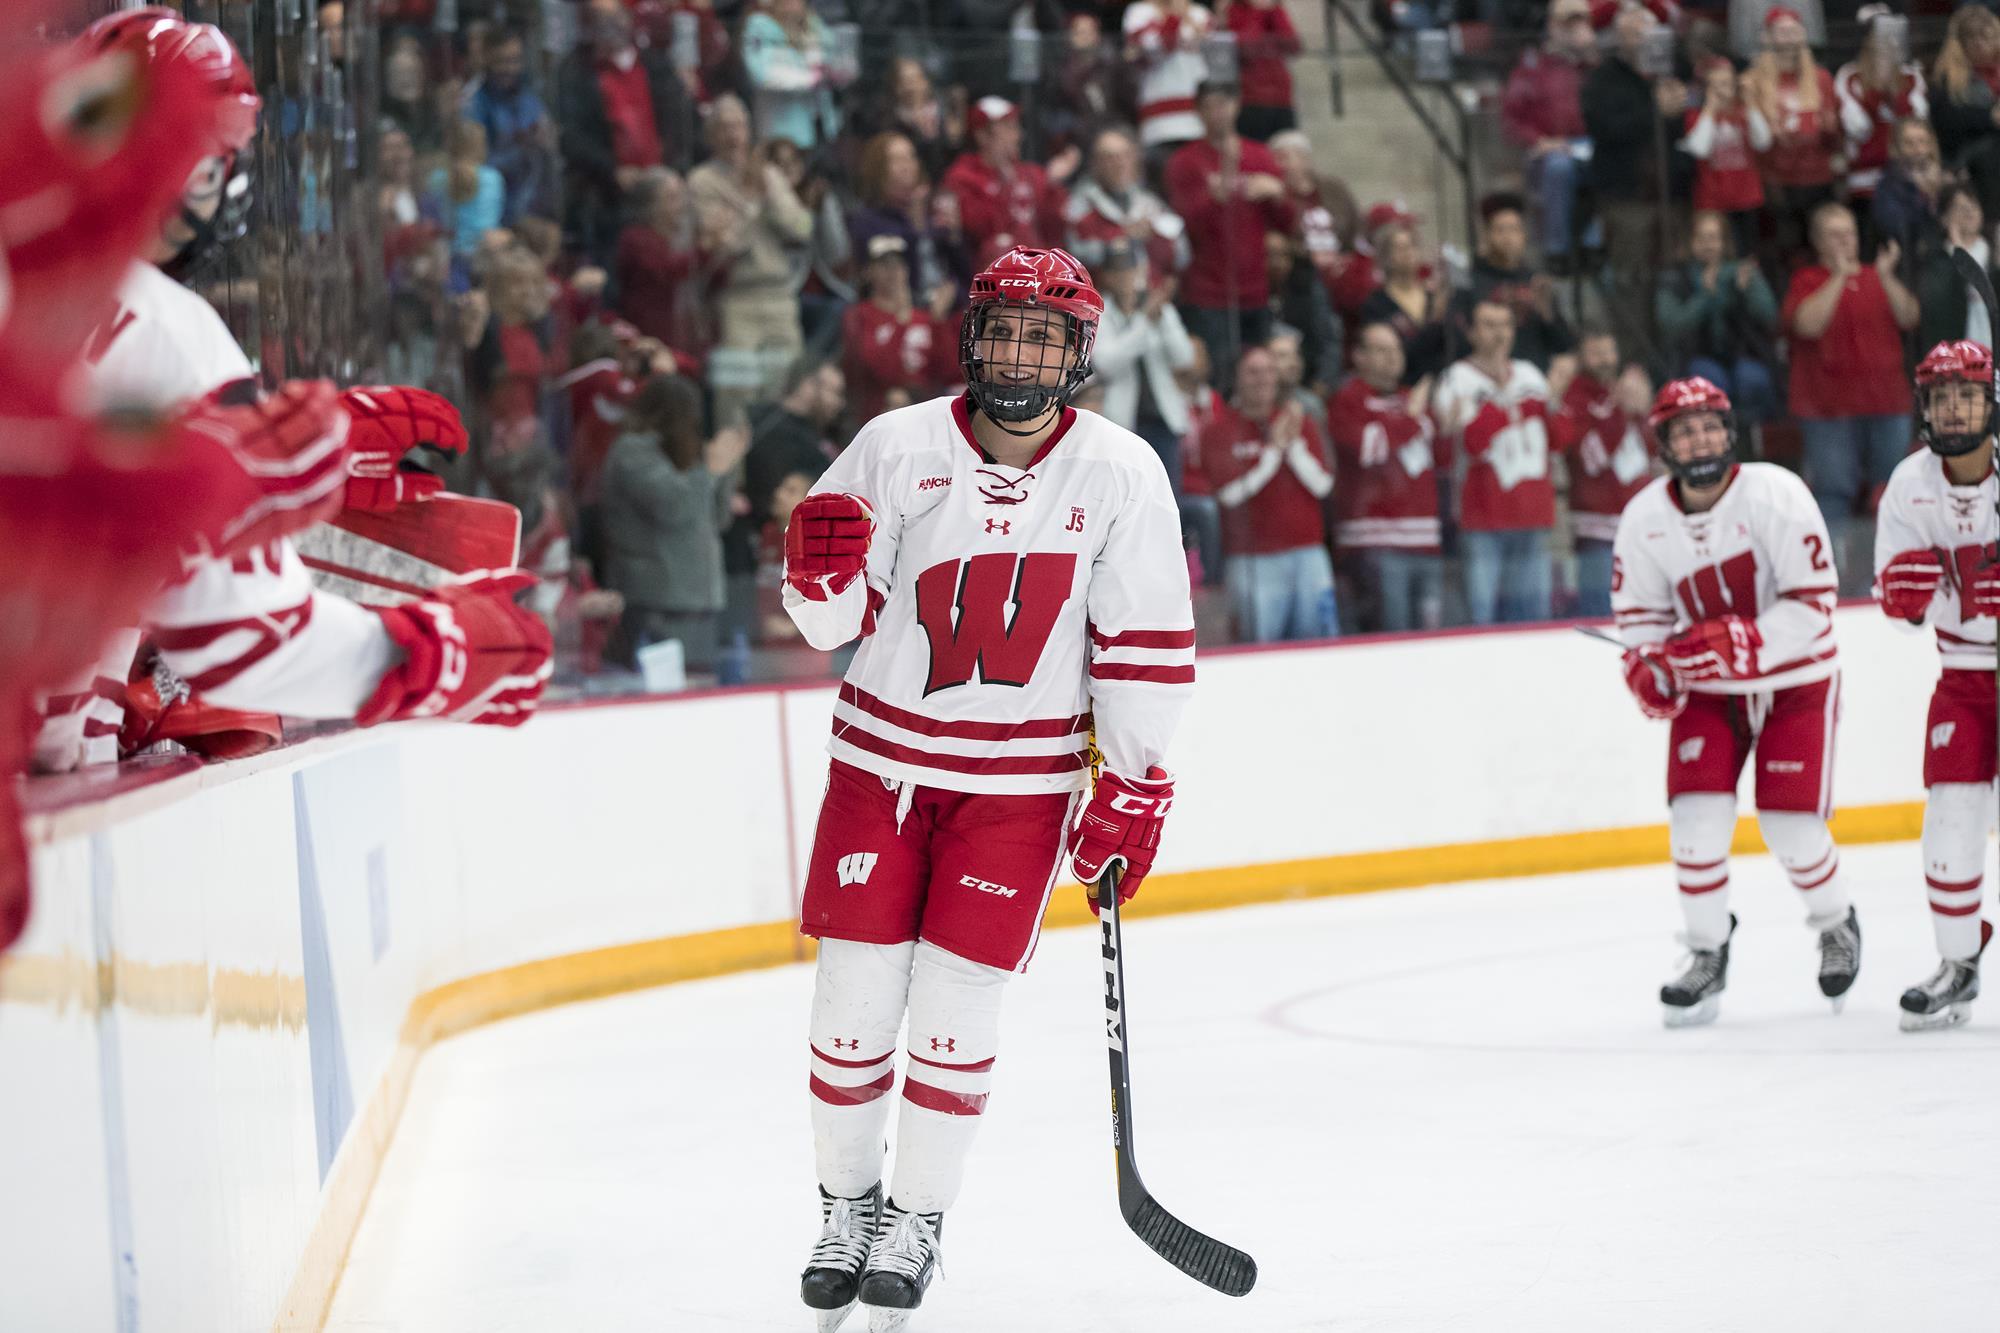 Wisconsin's Pankowski Named To NCAA Woman Of The Year Award Final 30